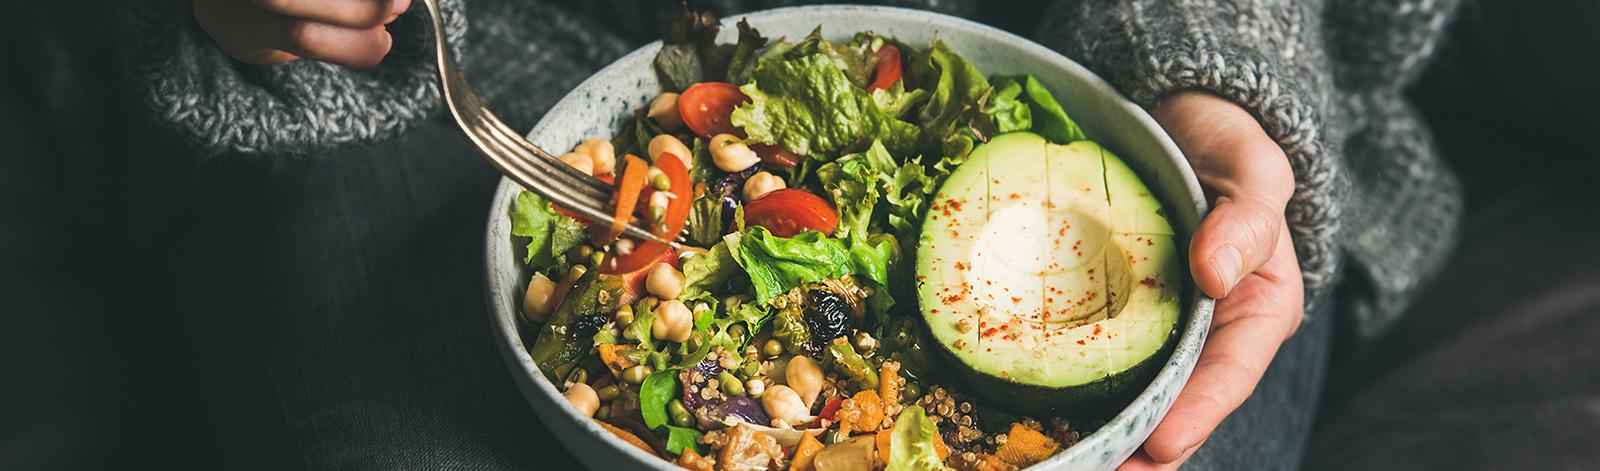 Woman eating a healthy salad bowl